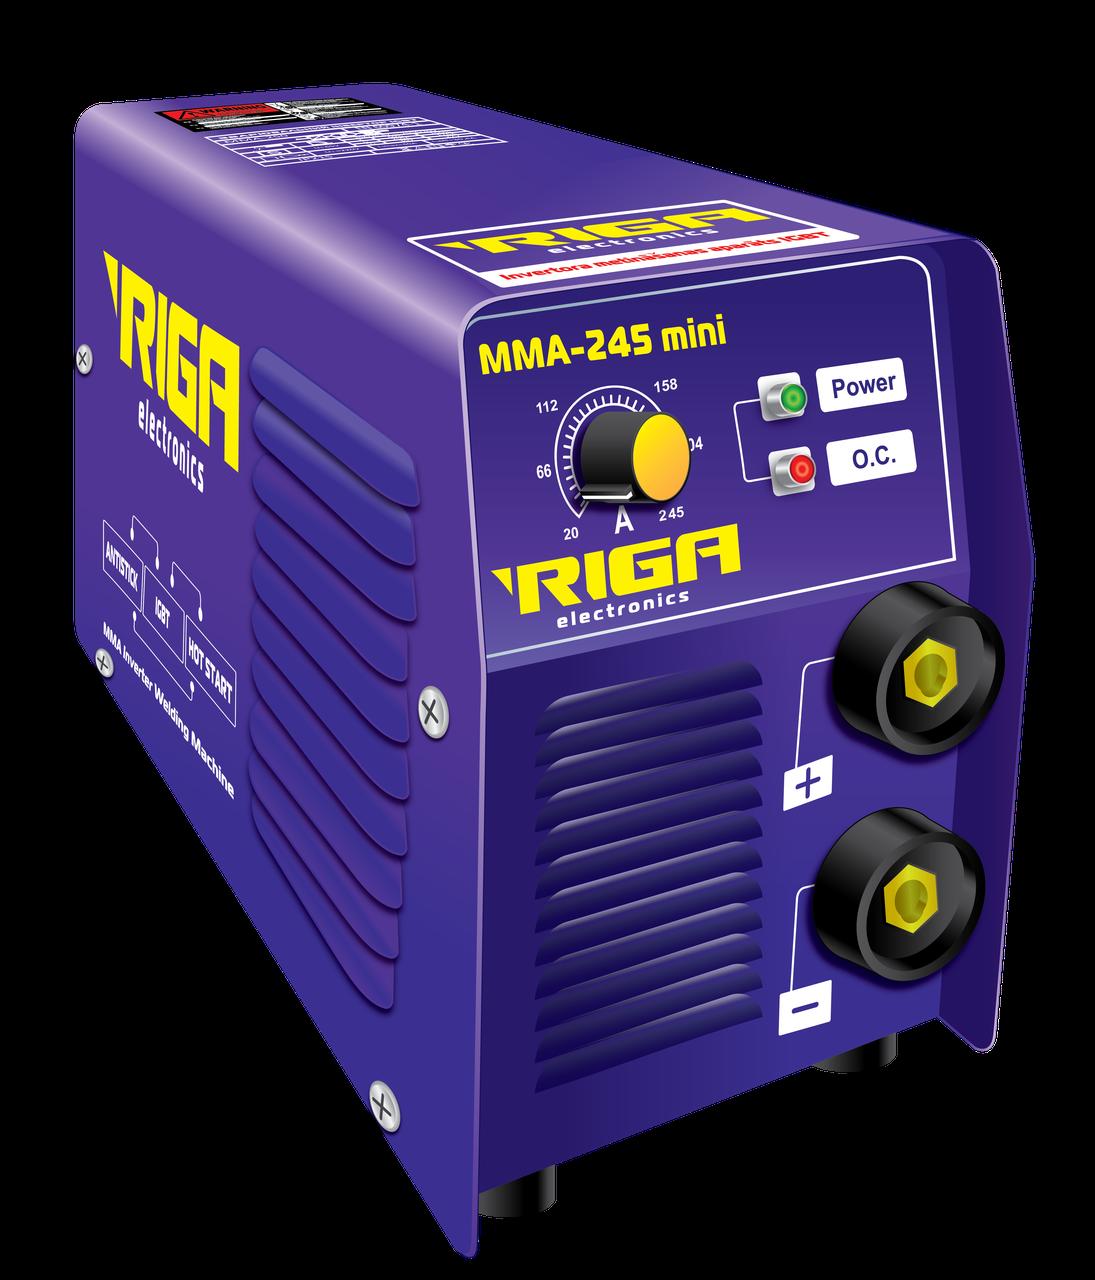 Сварочный инвертор RIGA ММА IGBT MINI 255 (70974007)